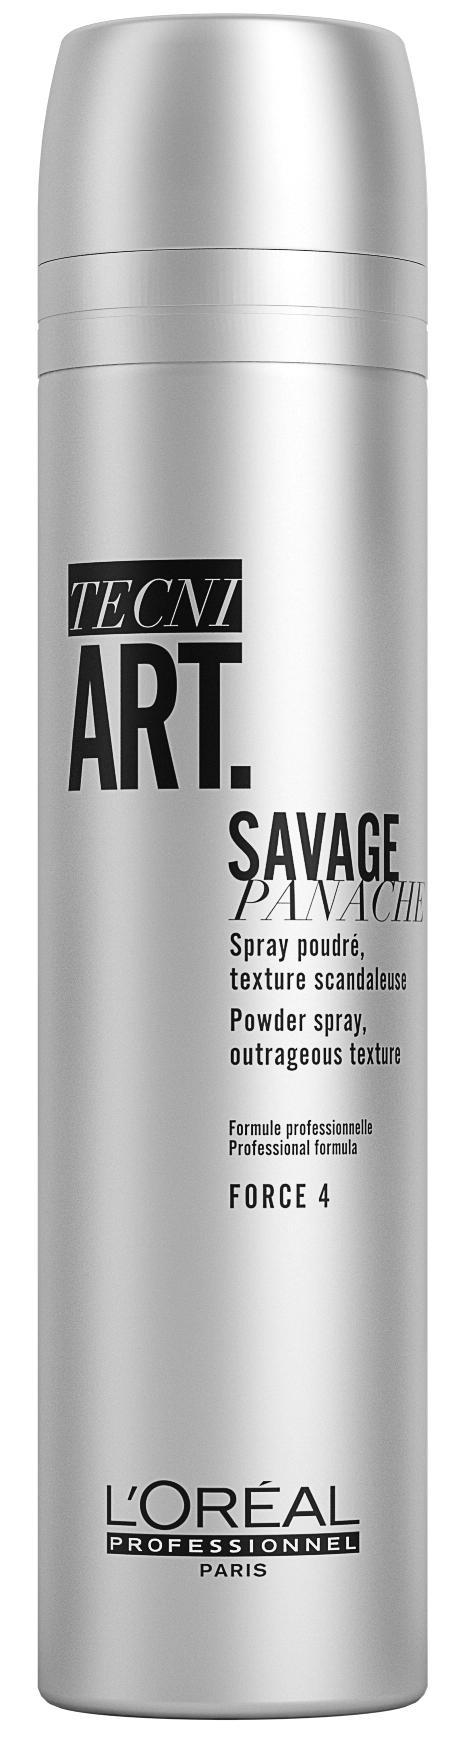 Tecni.art Savage Panache 250 ml